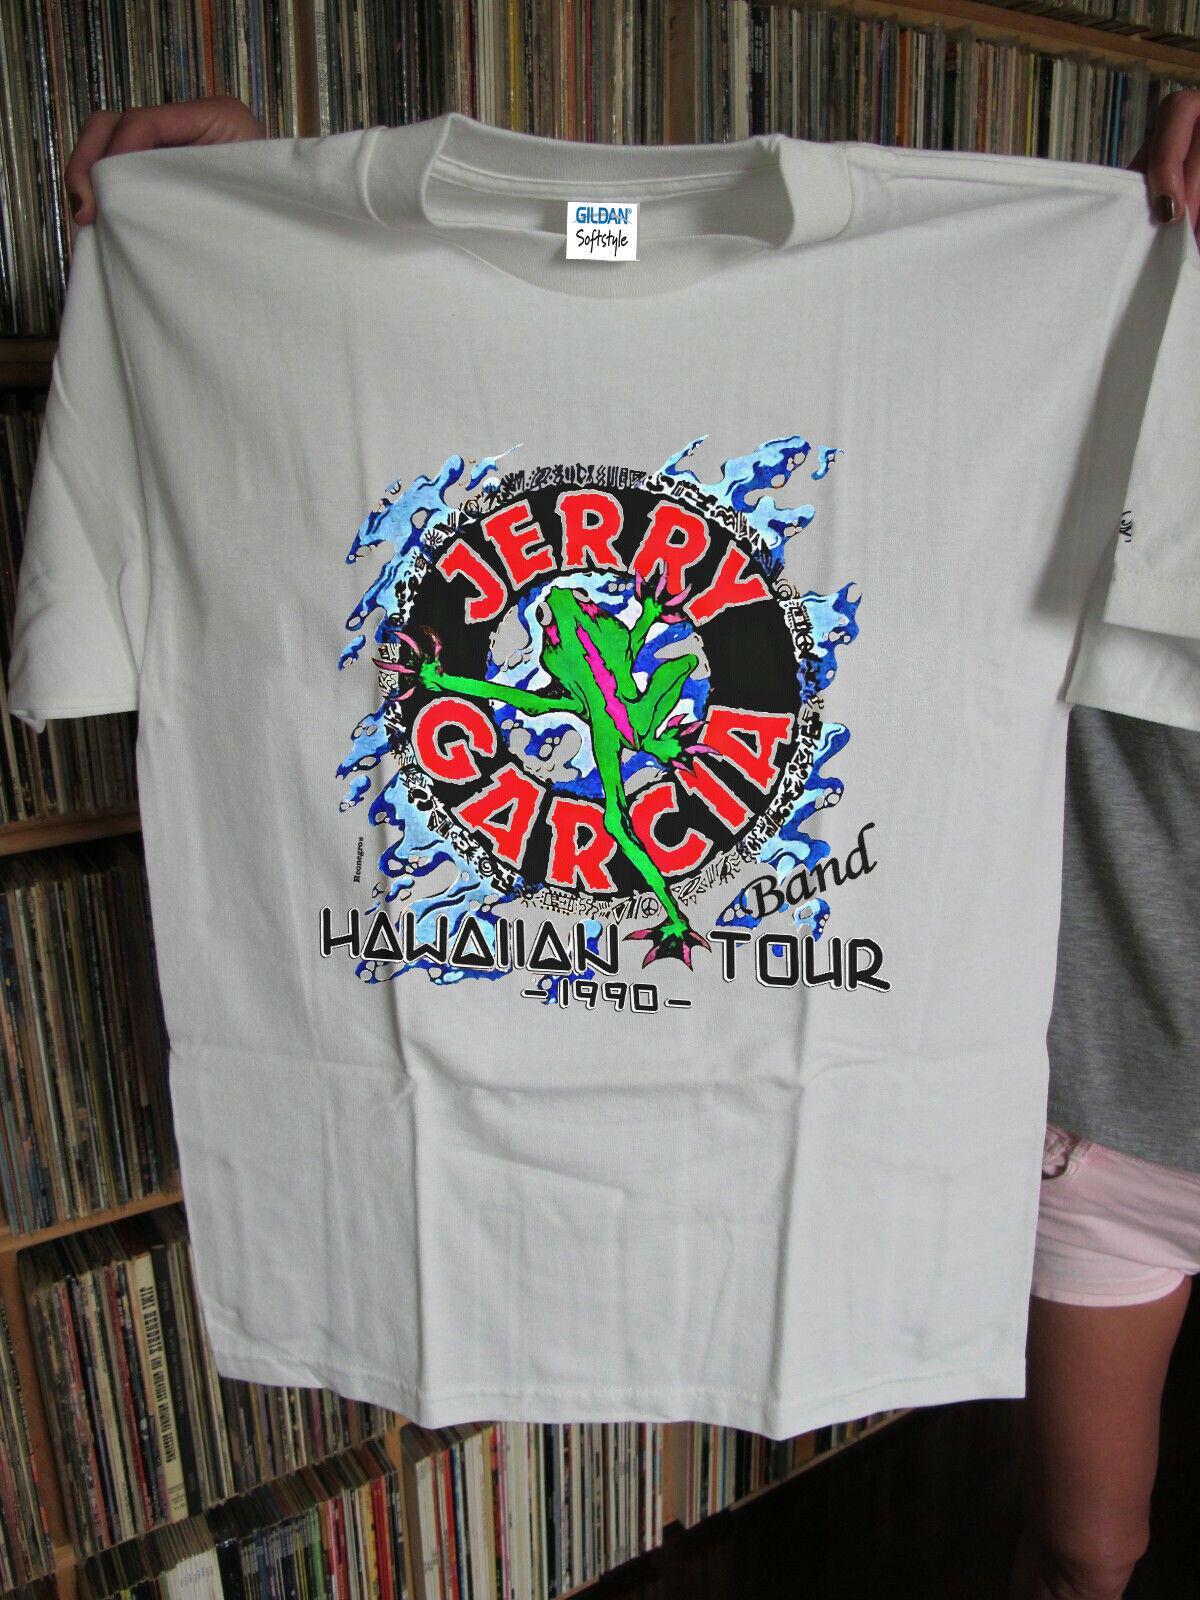 grateful dead shirt 1990 GDM Jerry Garcia Band Shirt 1990 vintage S-3XL Men  Women Unisex Fashion tshirt Free Shipping black